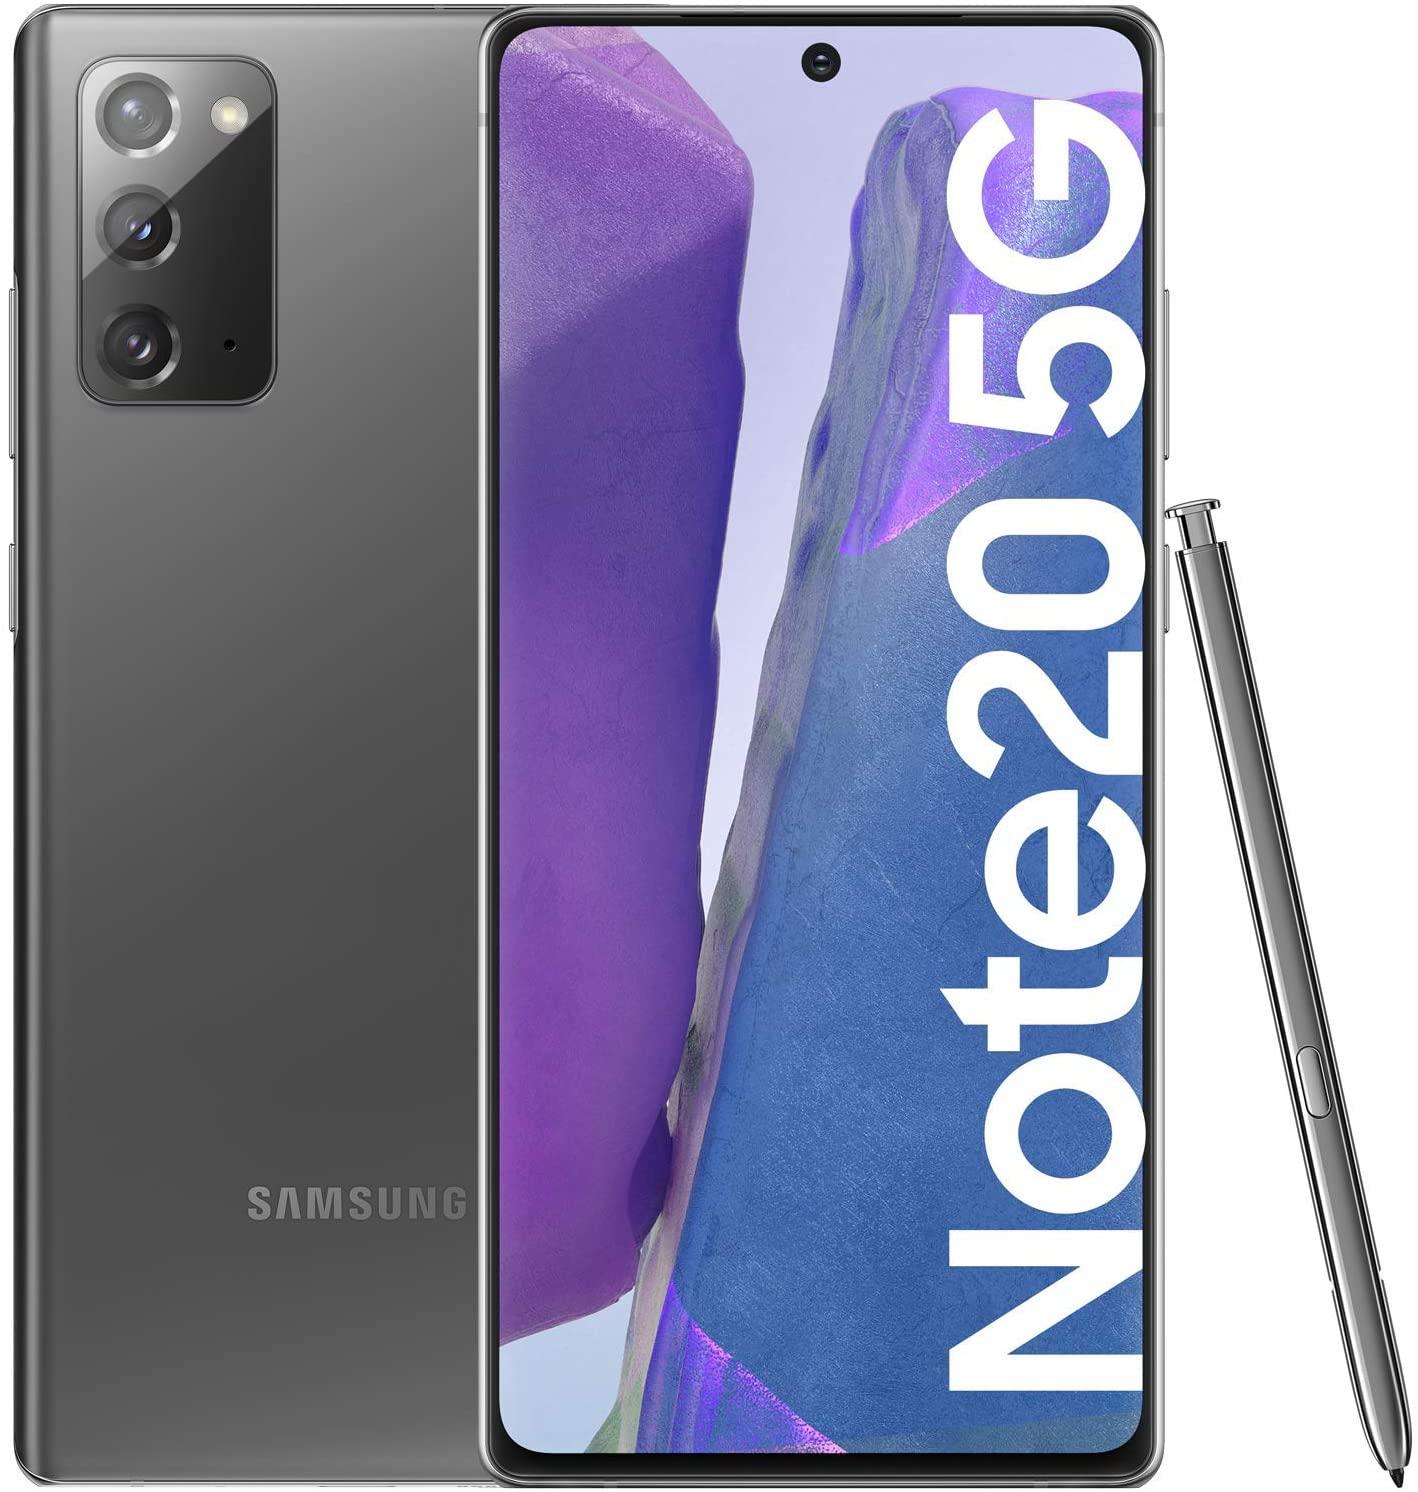 Samsung Galaxy Note 20 5G 256GB Mystic Gray £575.40 (£561 using fee free card) @ Amazon Spain (UK Mainland)